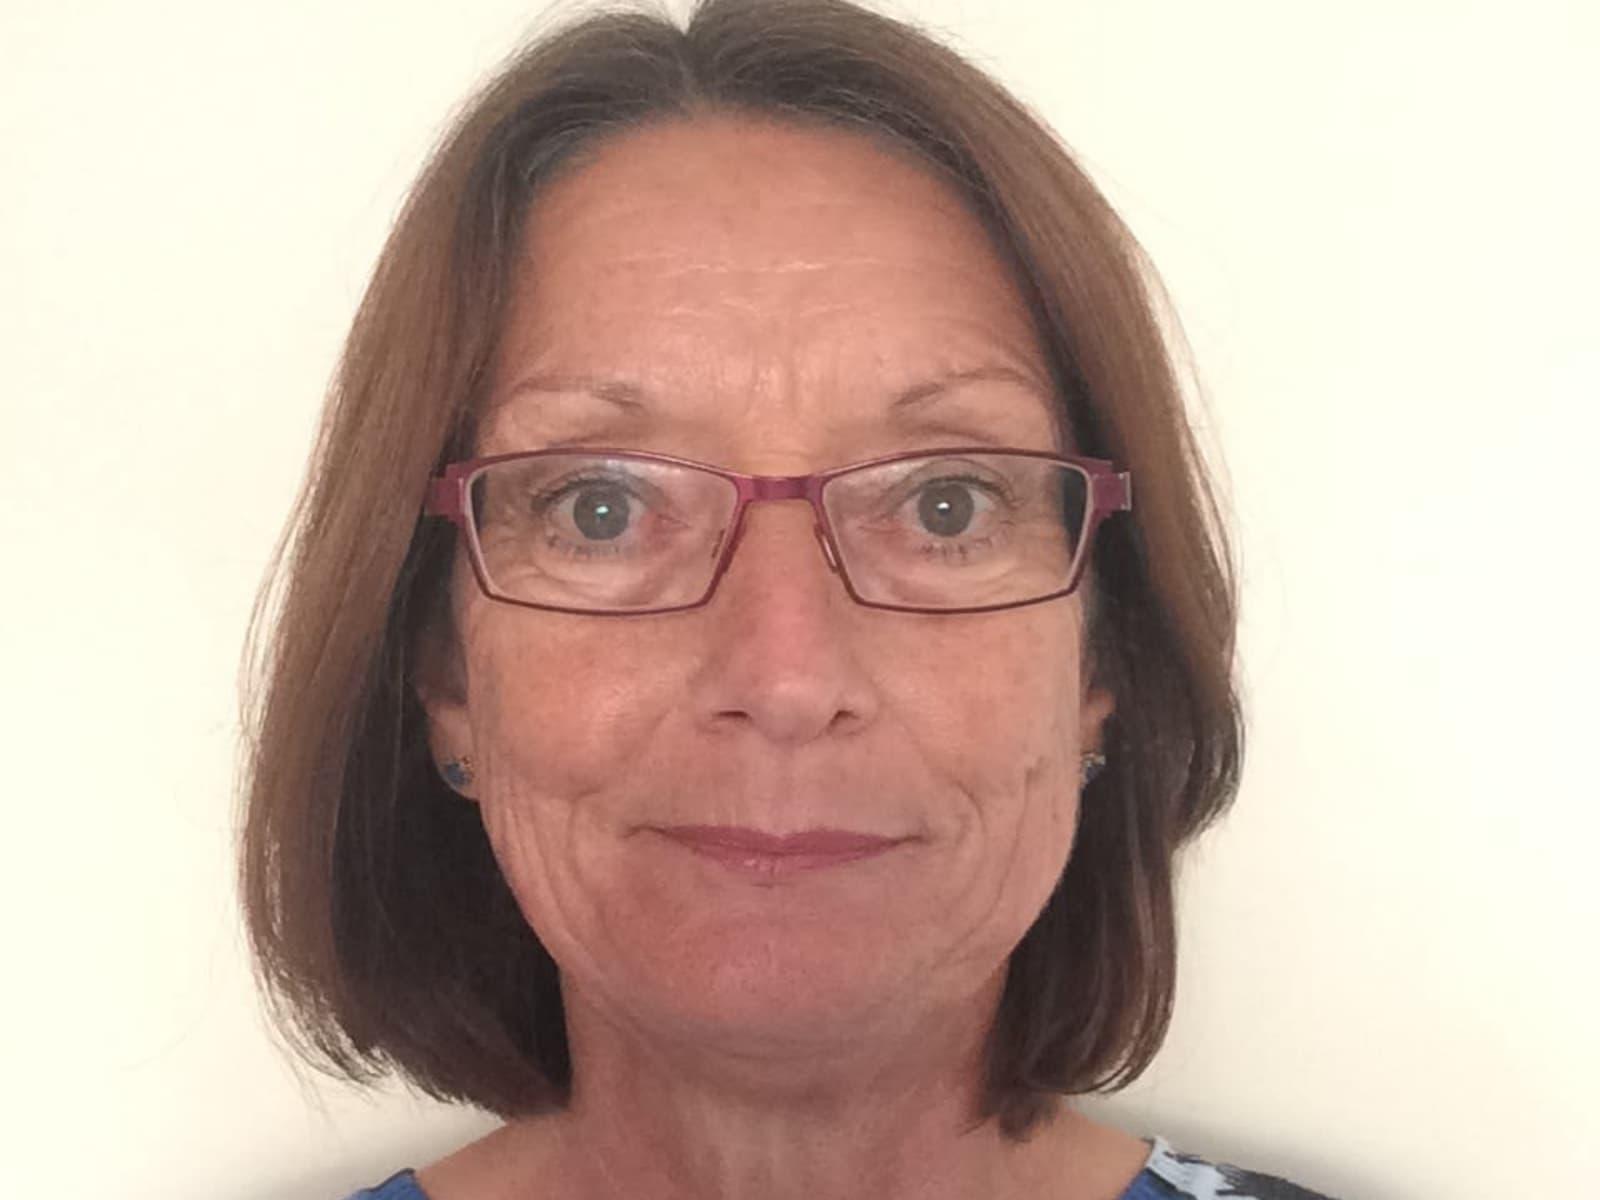 Andrea from Ipswich, United Kingdom